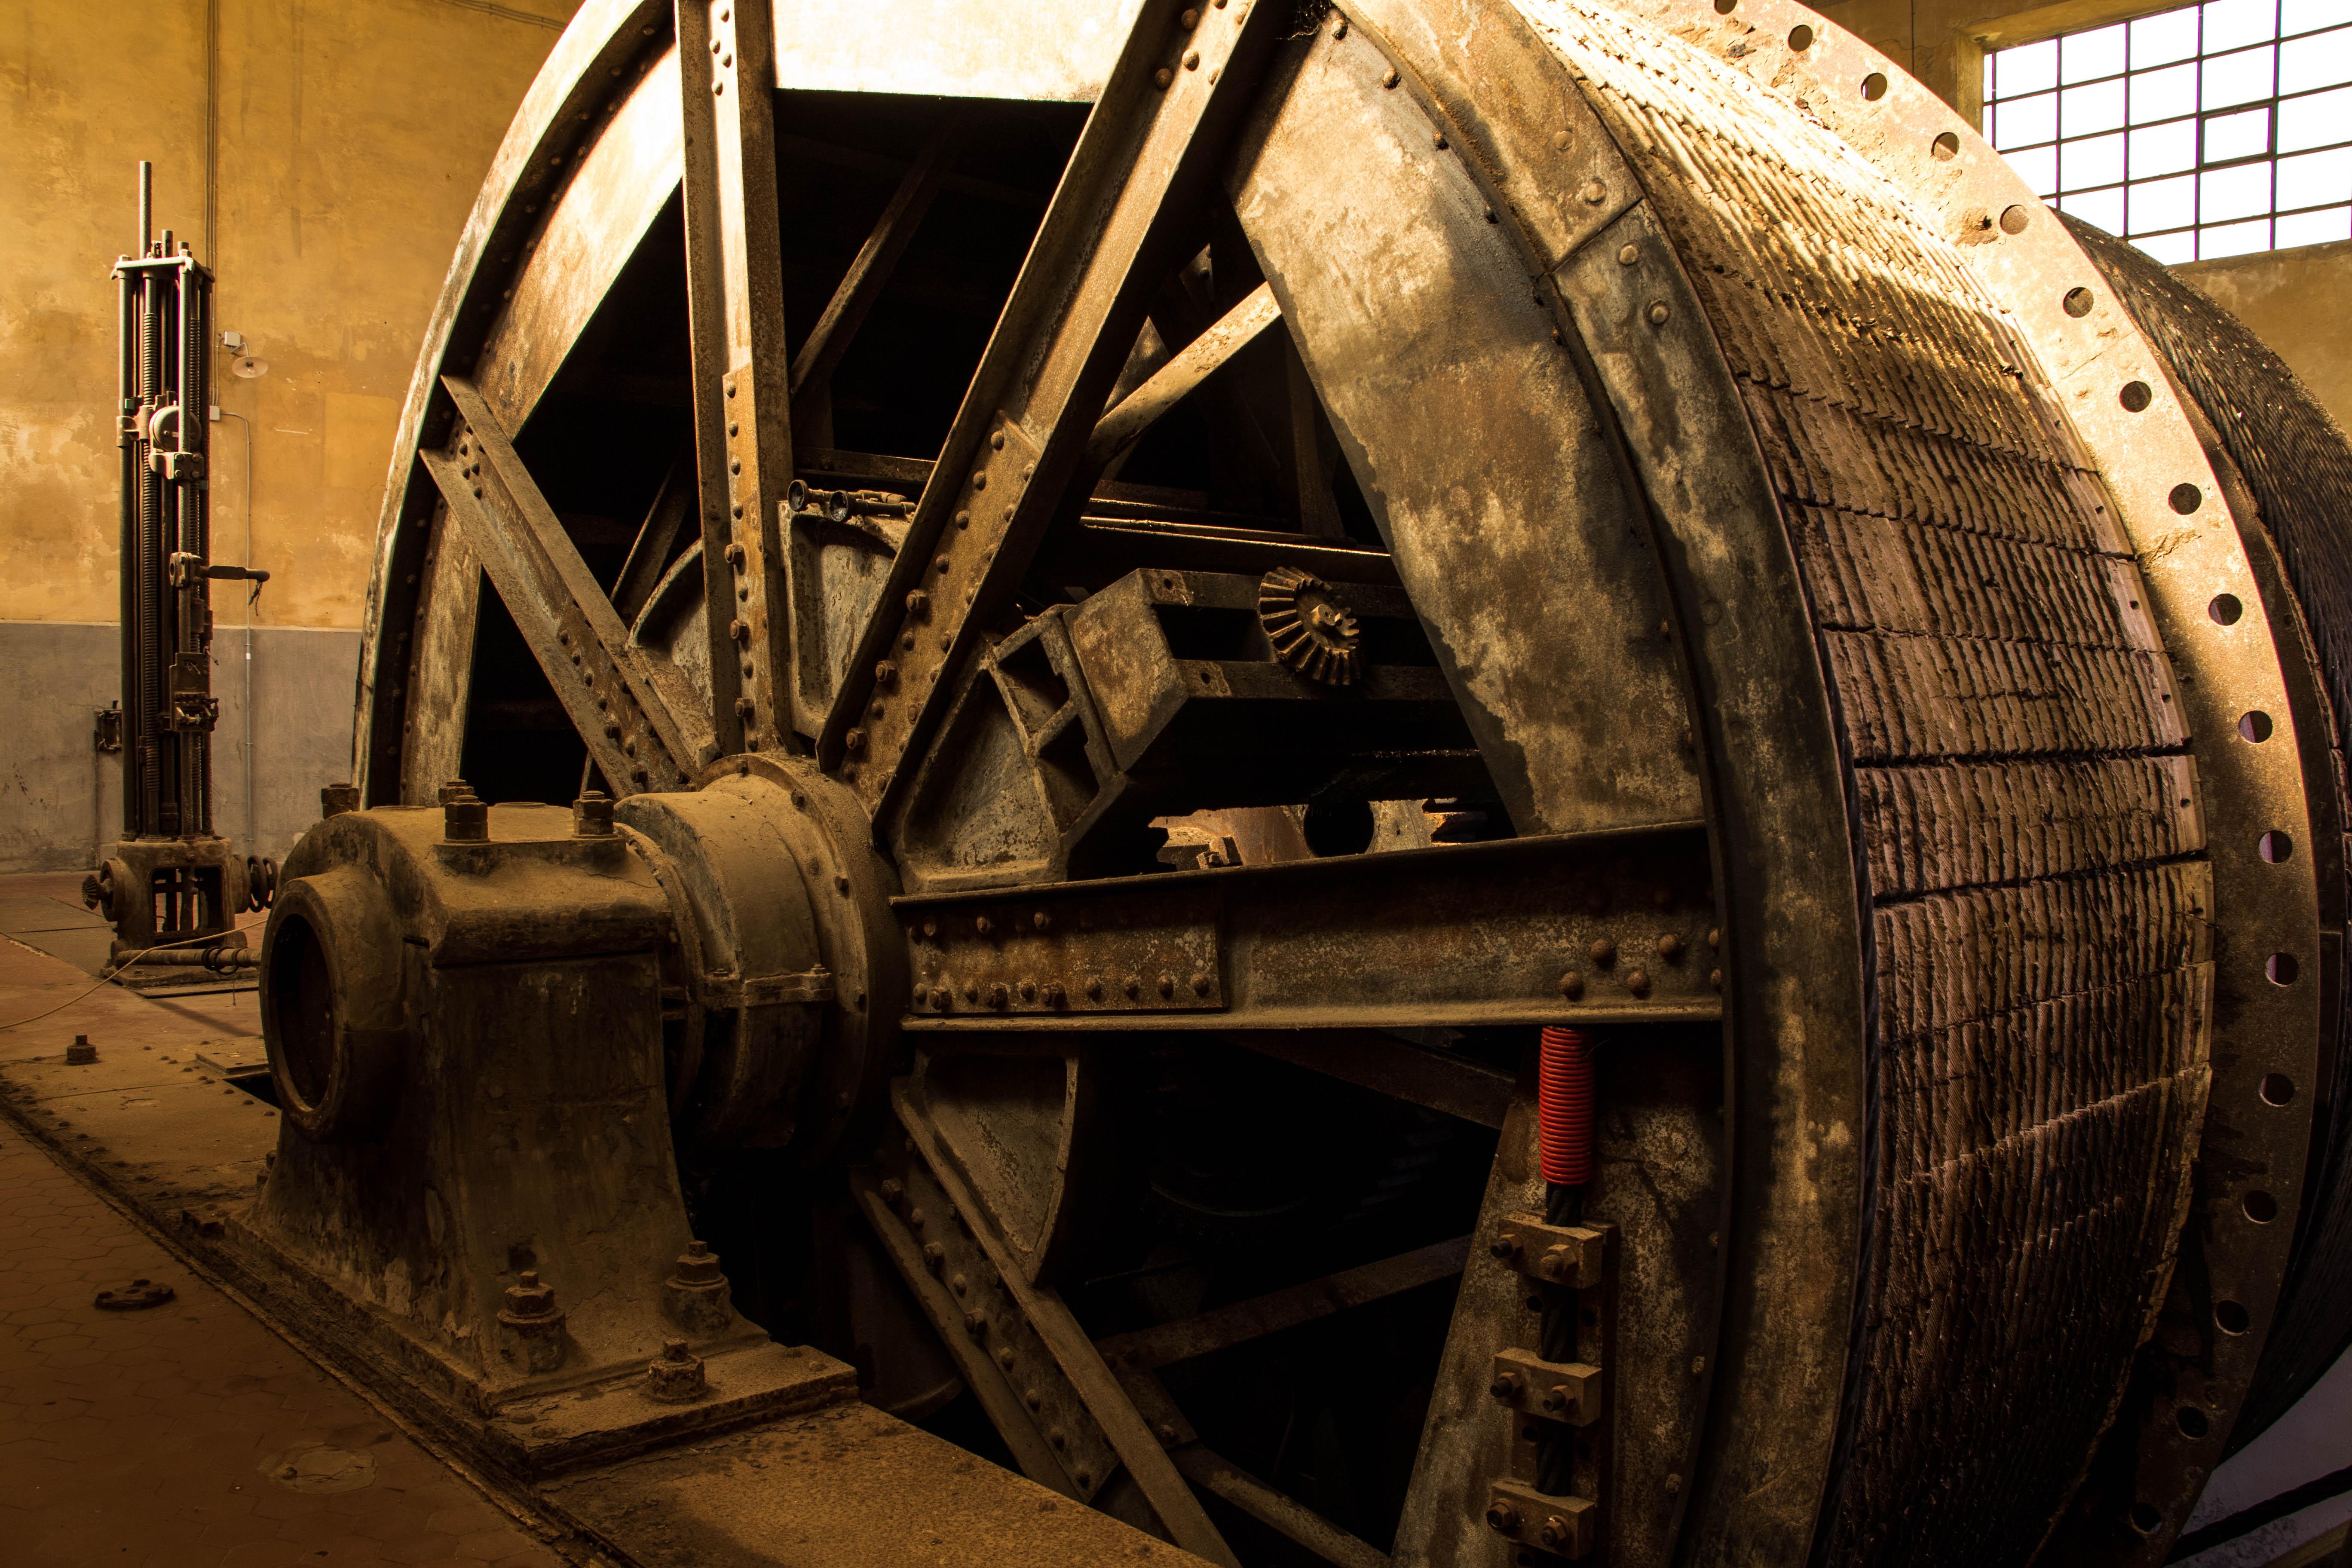 Sala argani - Museo del carbone - Grande Miniera di serbariu, Carbonia